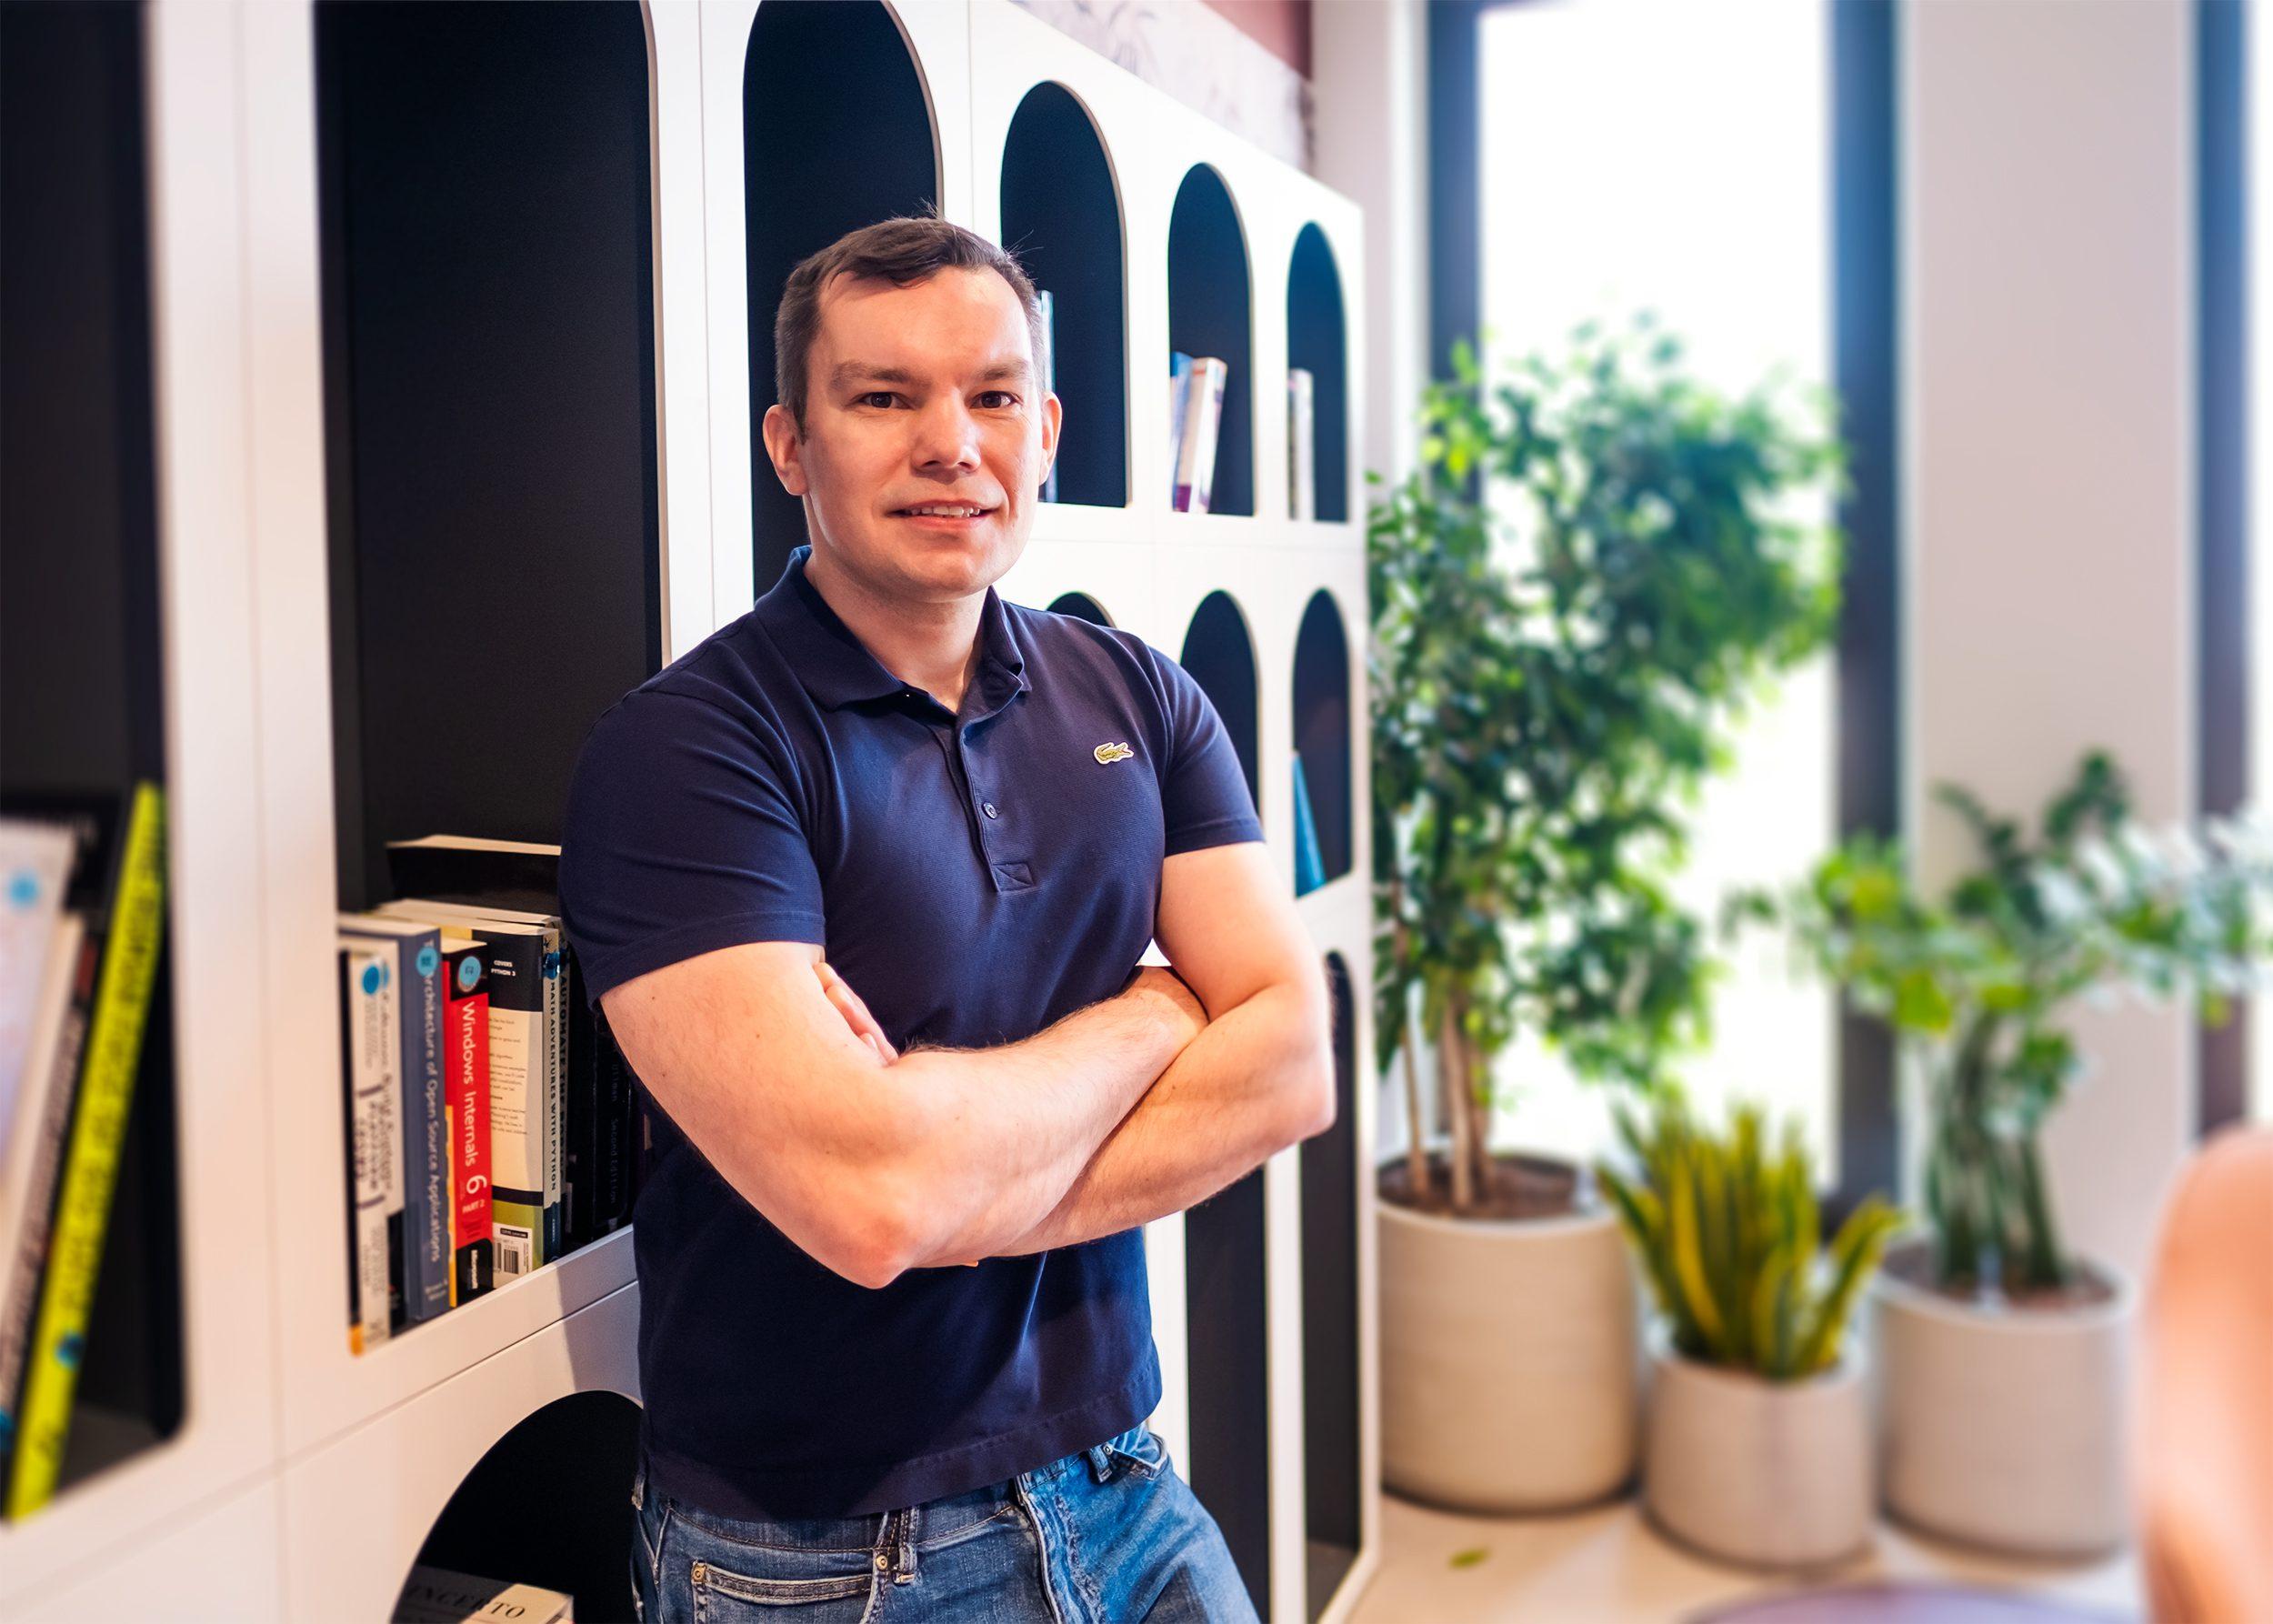 Konstantin Bulenkov, UI Team Lead at JetBrains